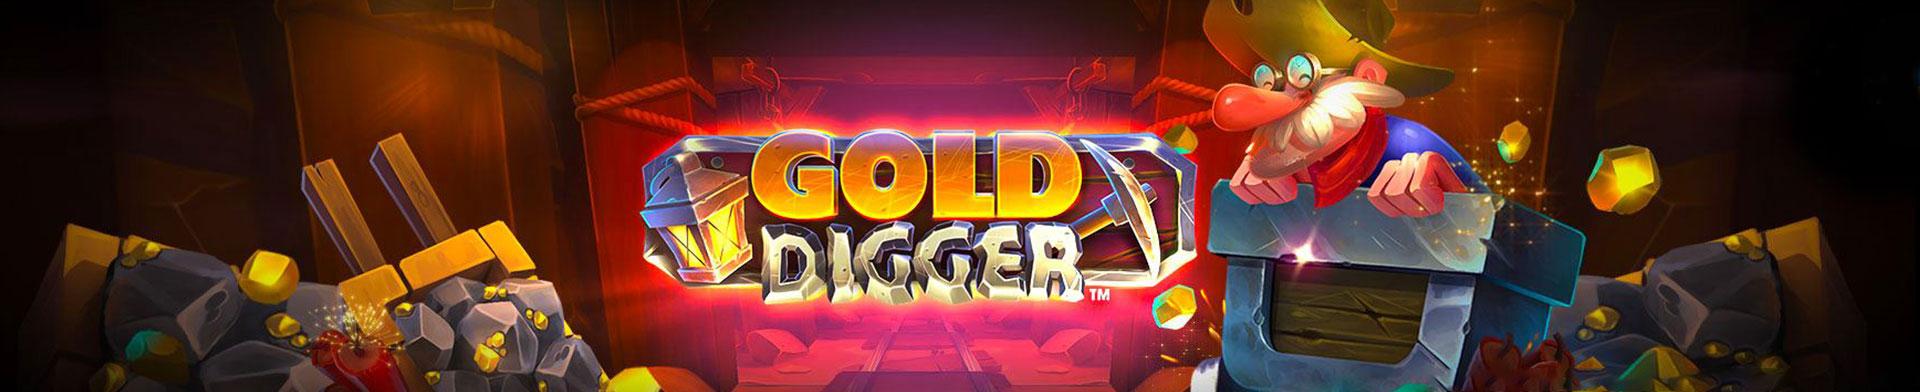 Gold Digger Banner